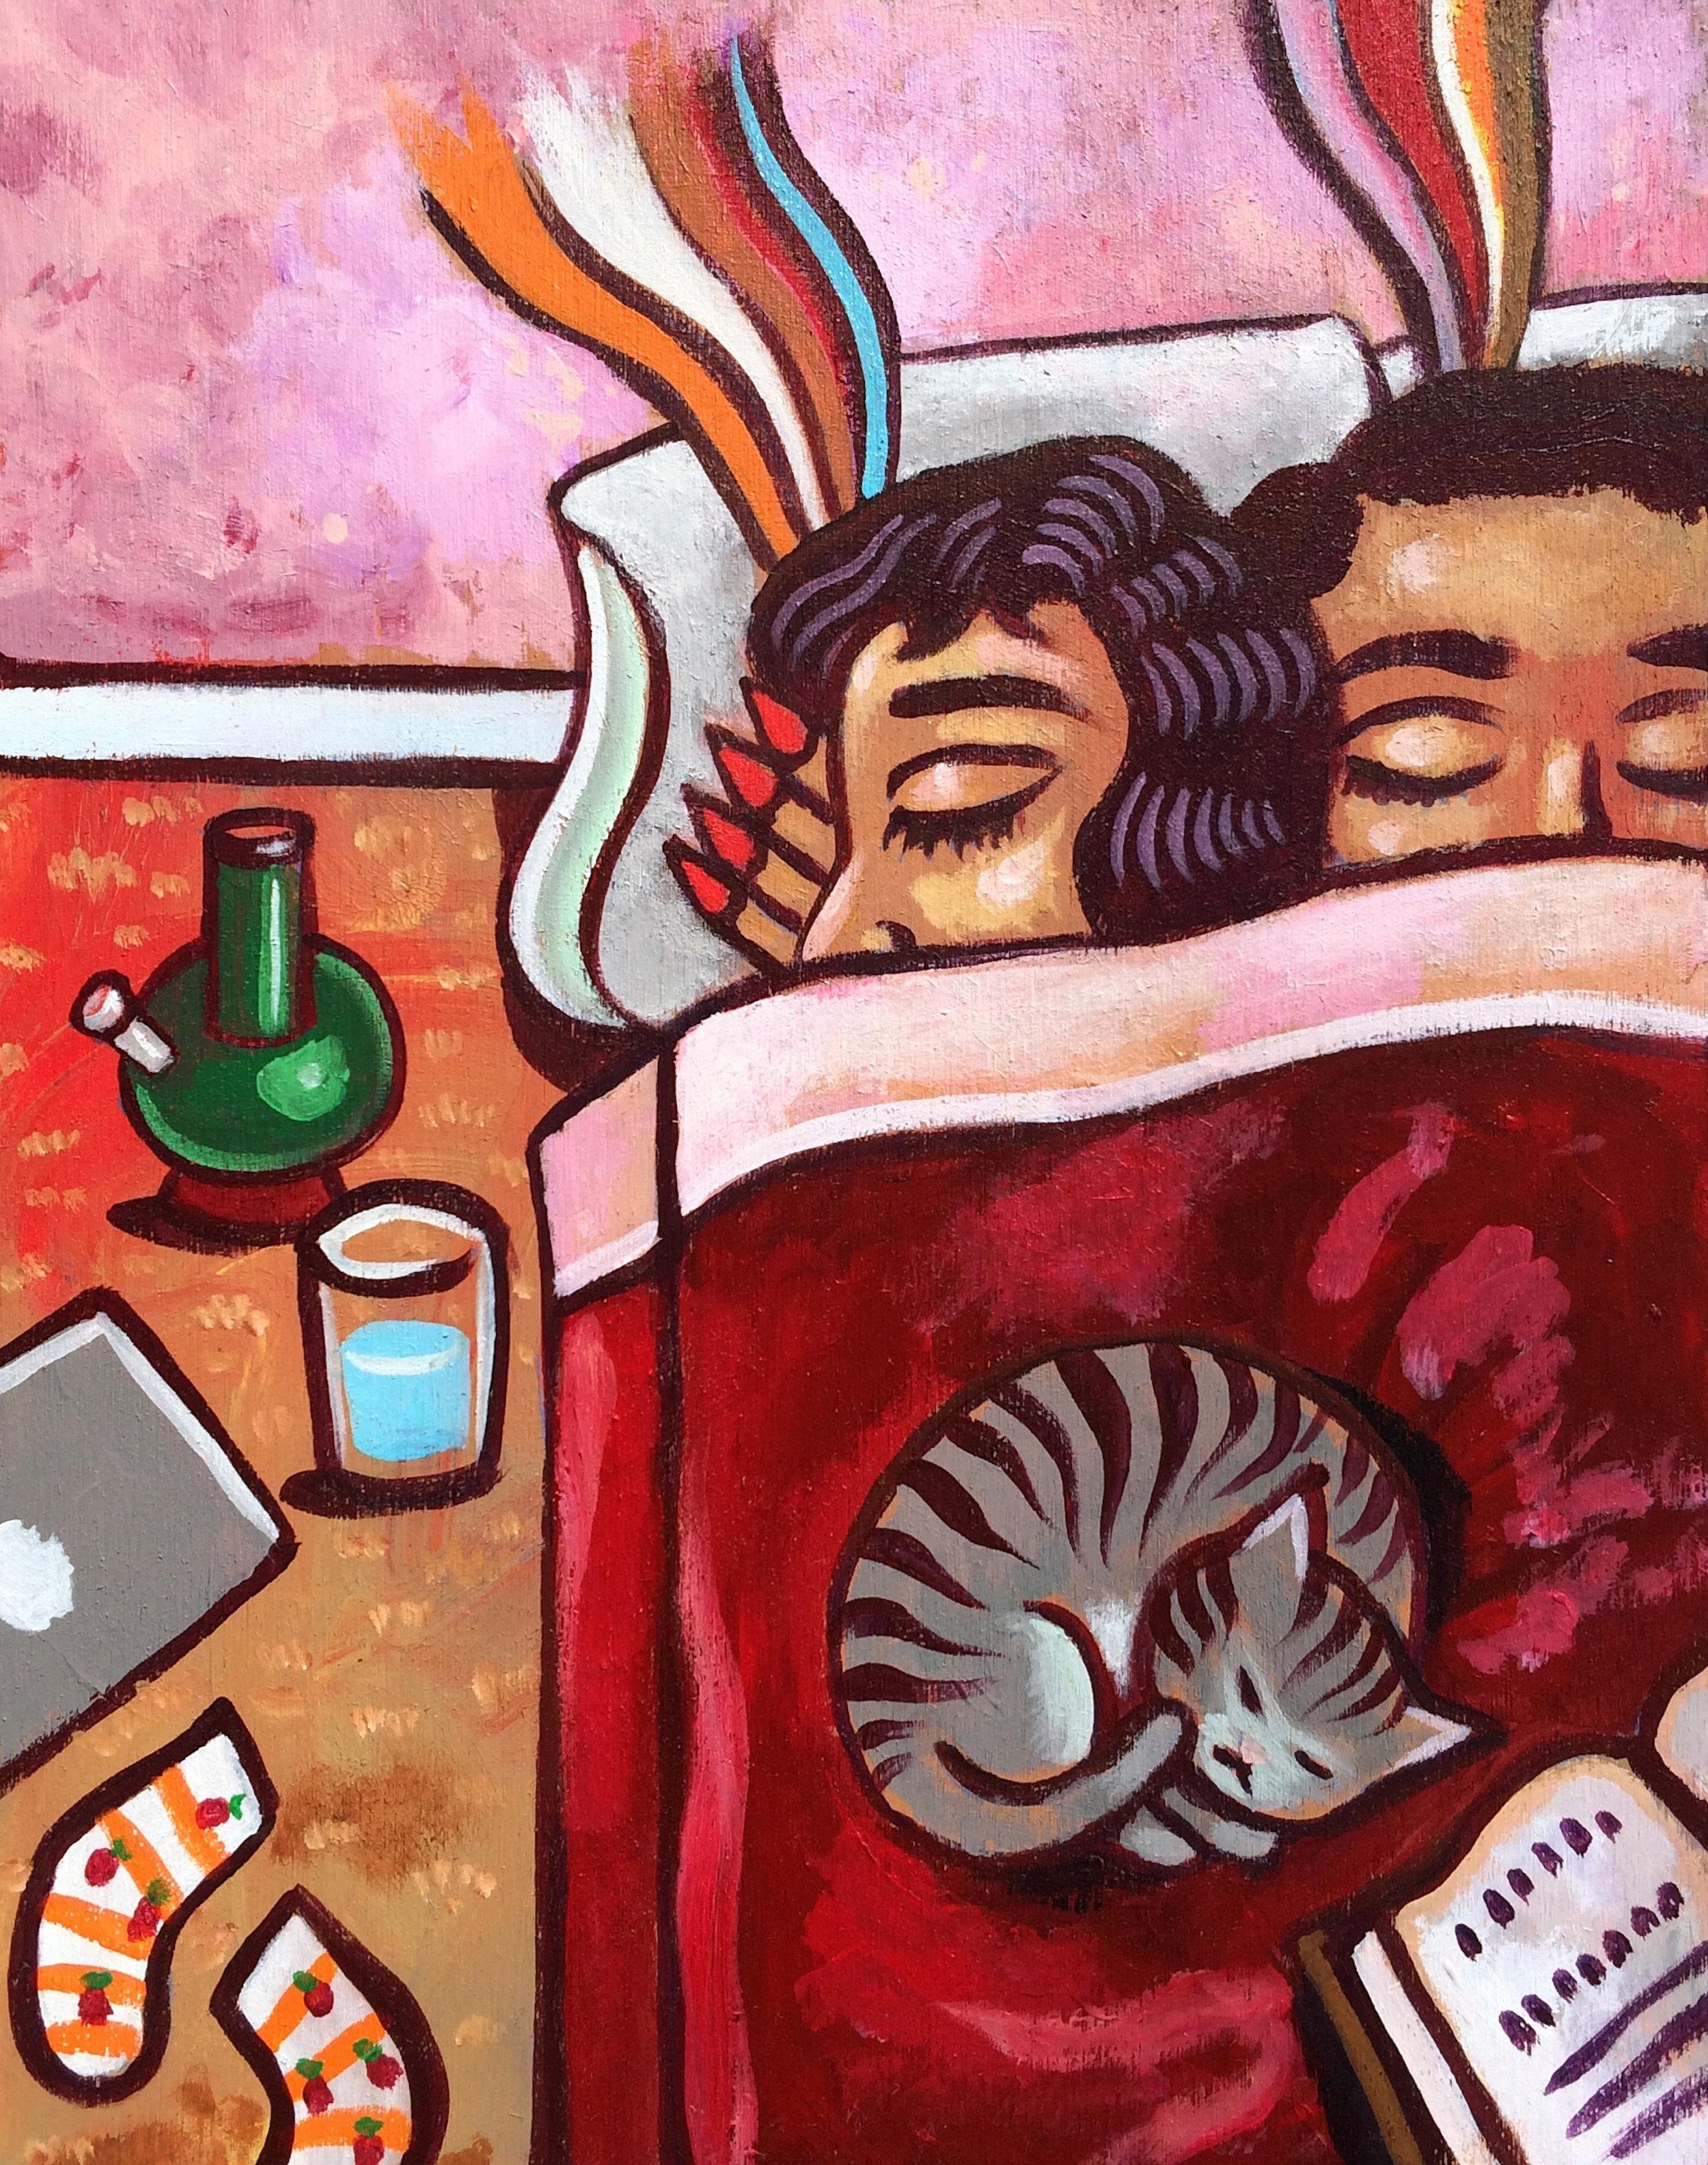 Sergio Hernandez // Pienso En Ti // 2018 // Acrylic on wood panel // 24 x 18 inches